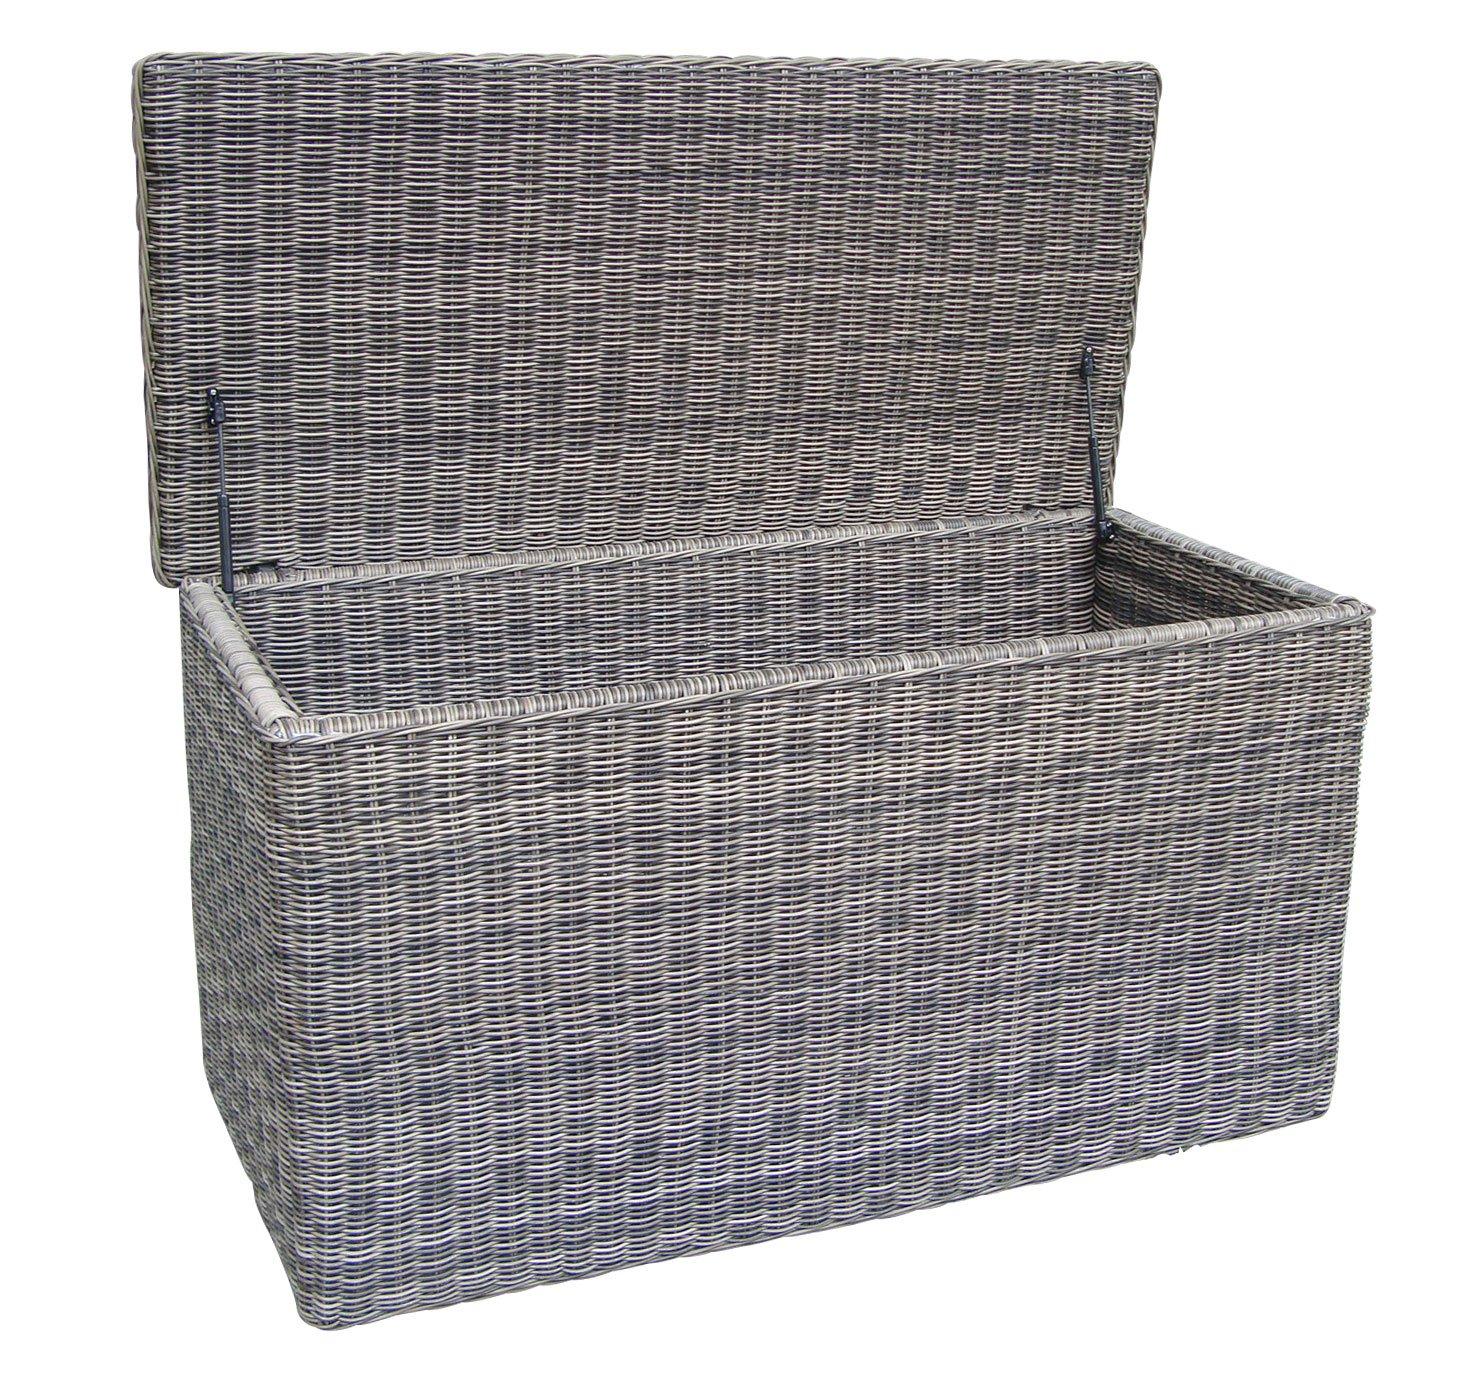 Baidani Gartenmöbel-Sets 10a00023 Designer Kissenbox Ronde, braun ...